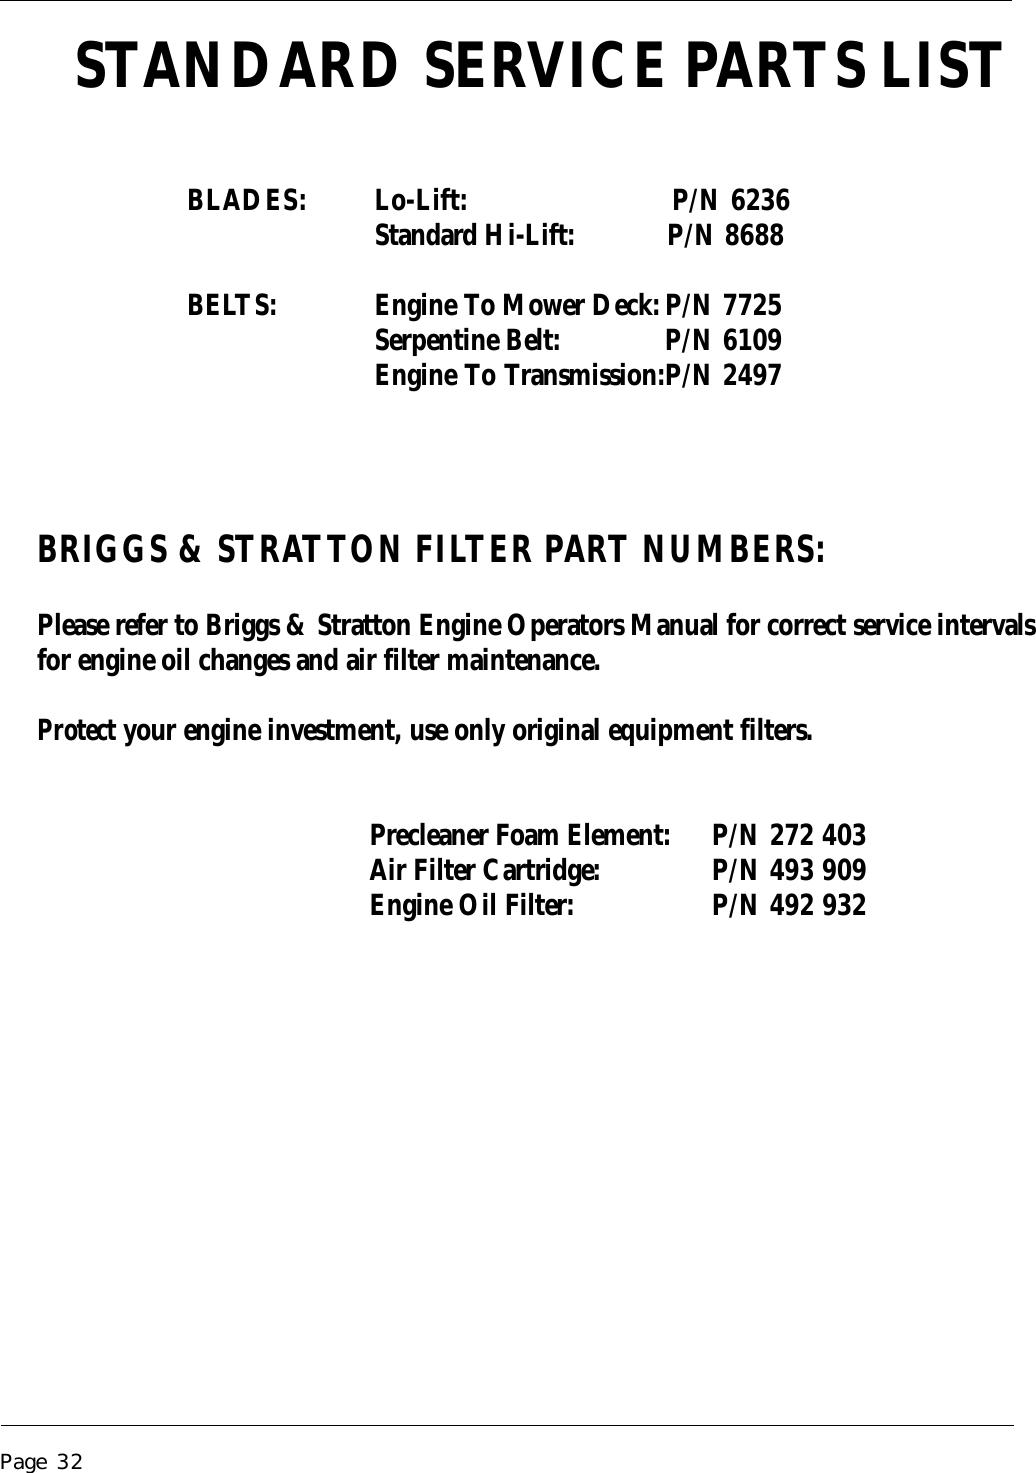 Dixon 1856 0599 Users Manual OM, ZTR 4000 SERIES, 4423, 2000